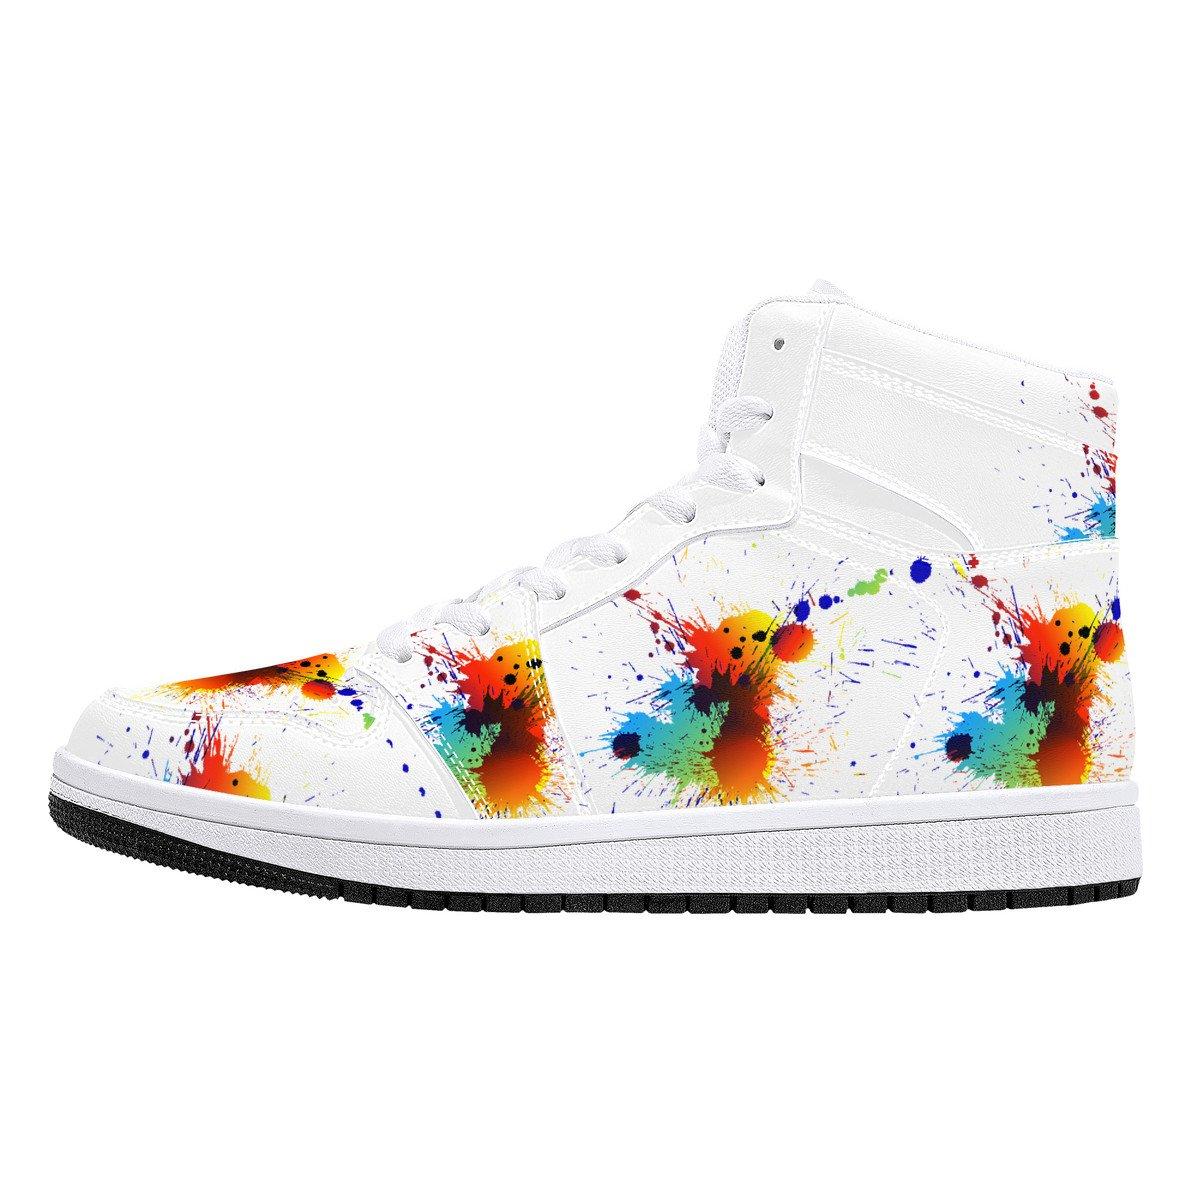 Fred Jo Leather Paint Splatter Sneakers - Fred jo Clothing